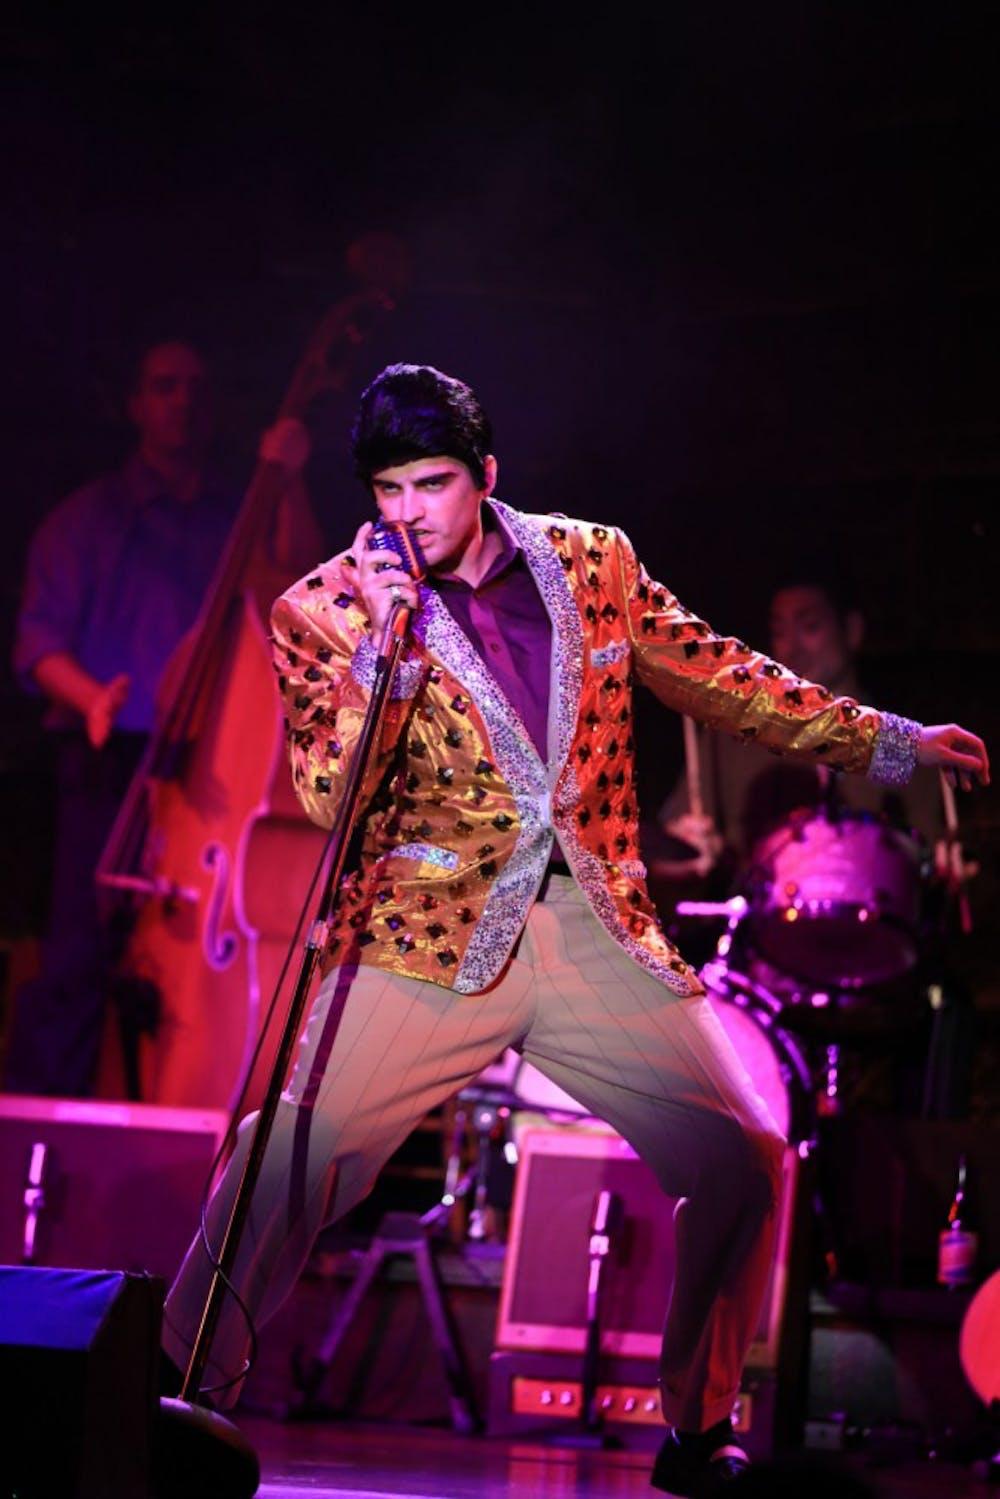 'Million Dollar Quartet' brings rock 'n' roll history to MemAud